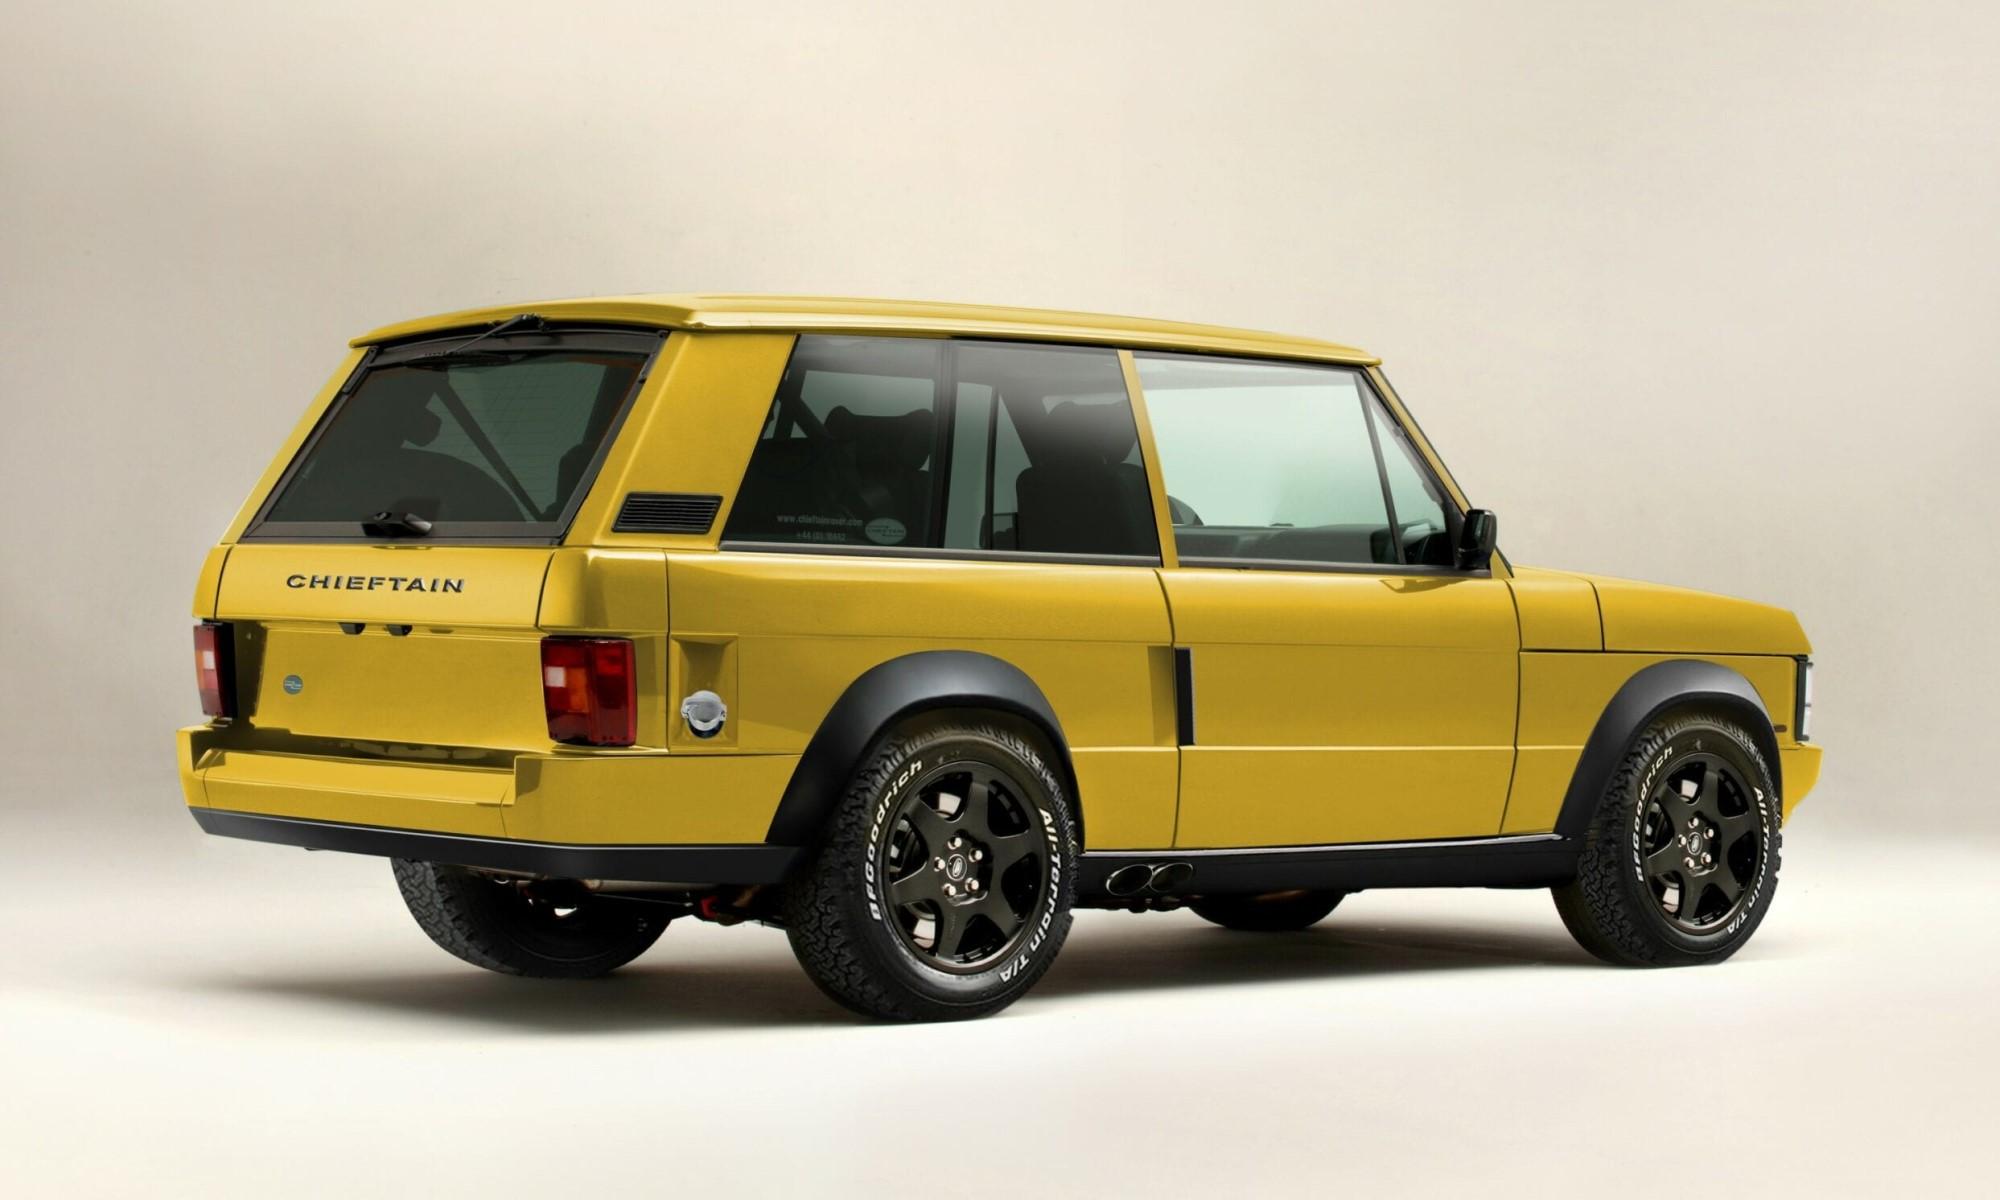 Chieftain Range Rover Classic rear